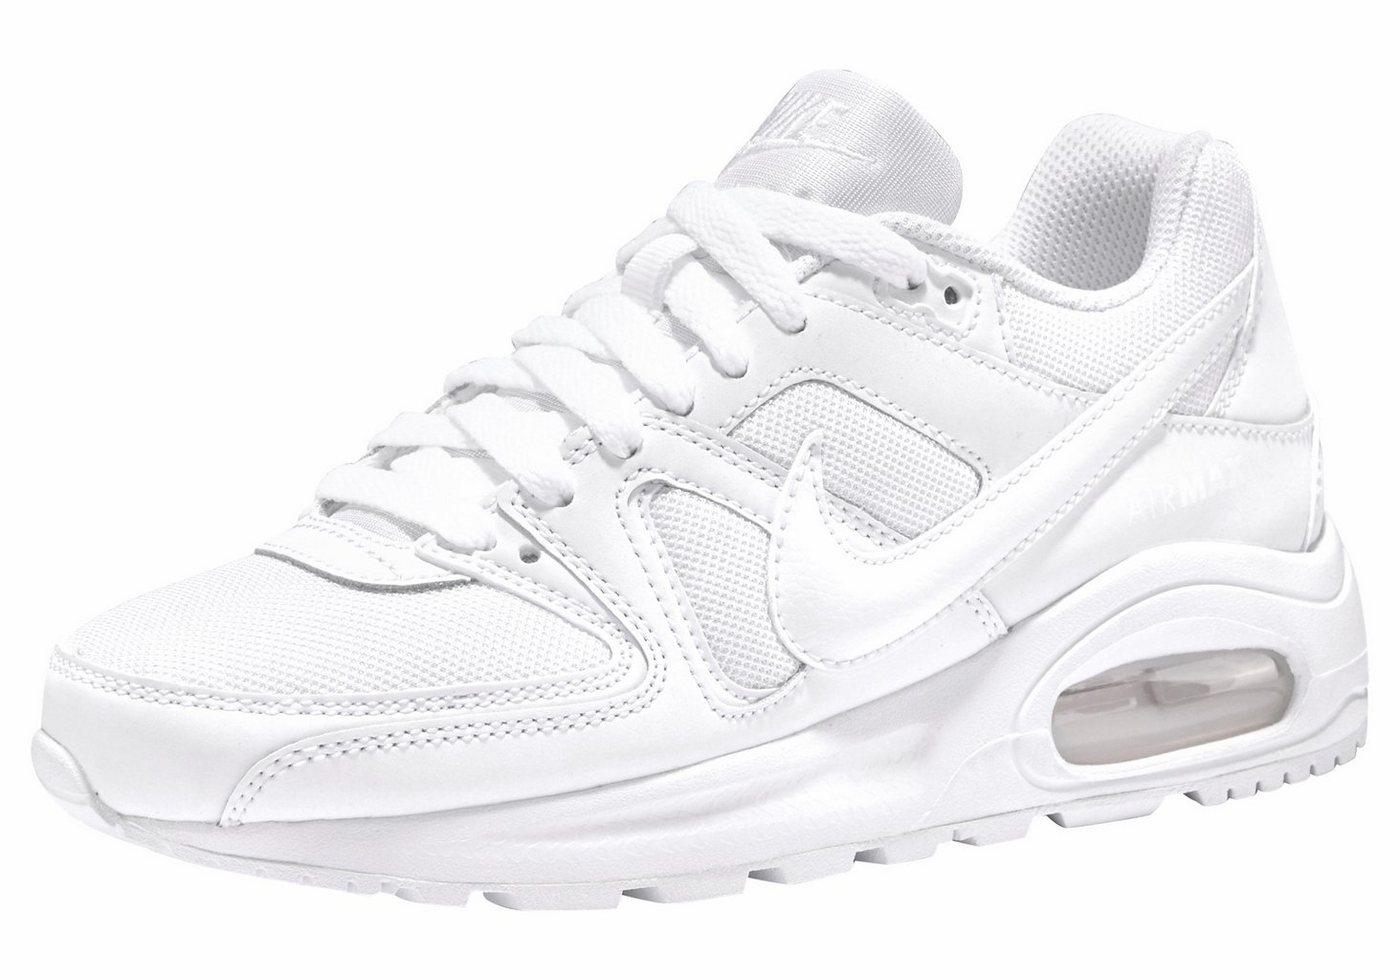 nike sportswear -  »Air Max Command Flex J« Sneaker Unisex